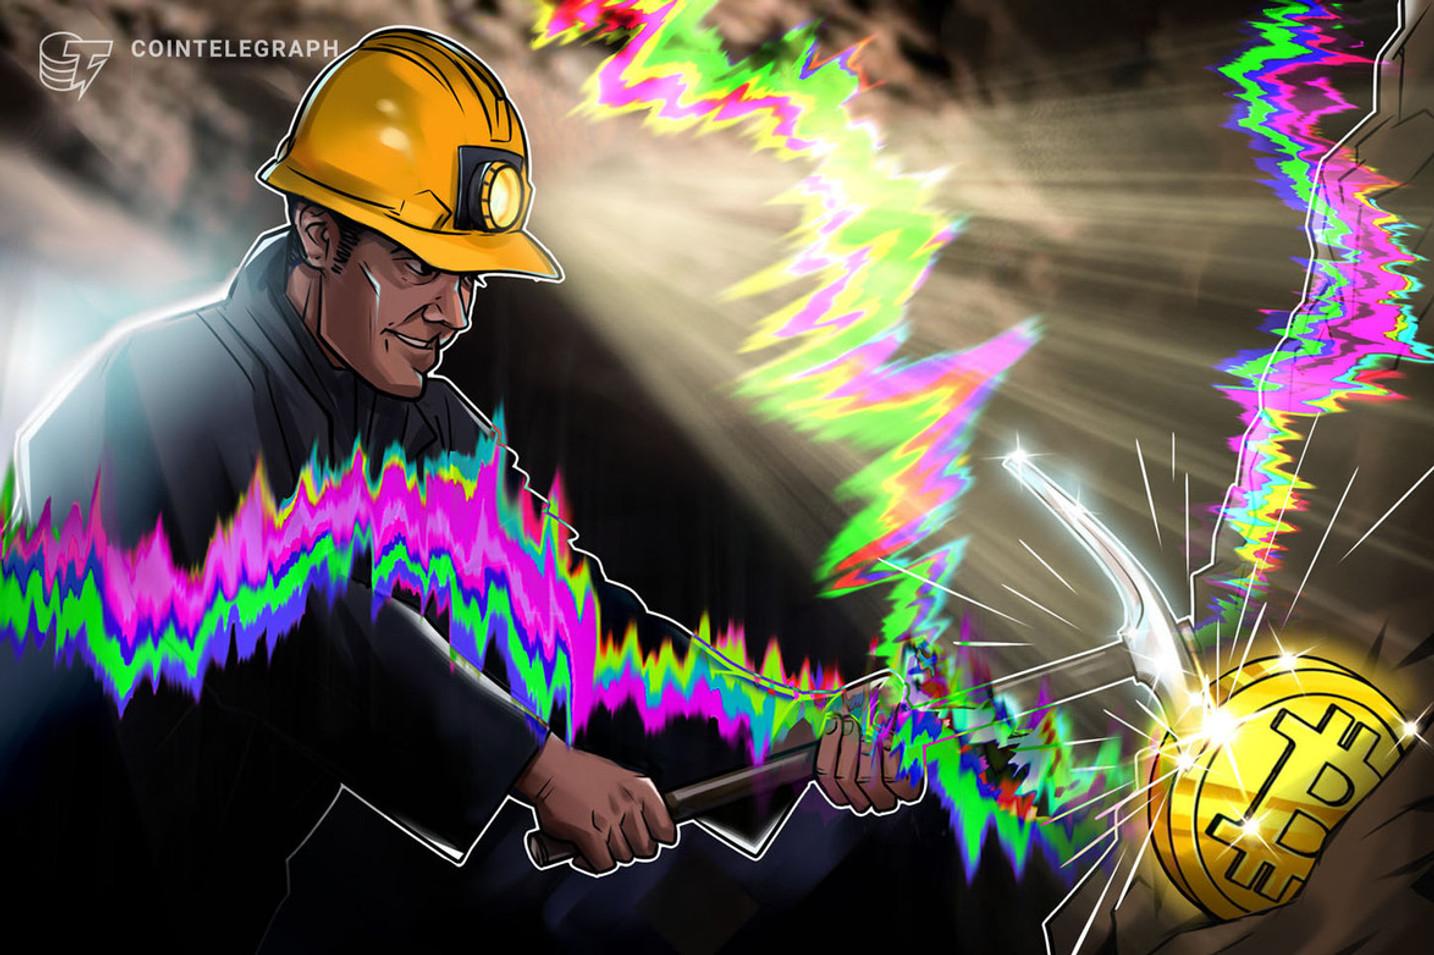 Os efeitos do Halving sobre o preço do Bitcoin